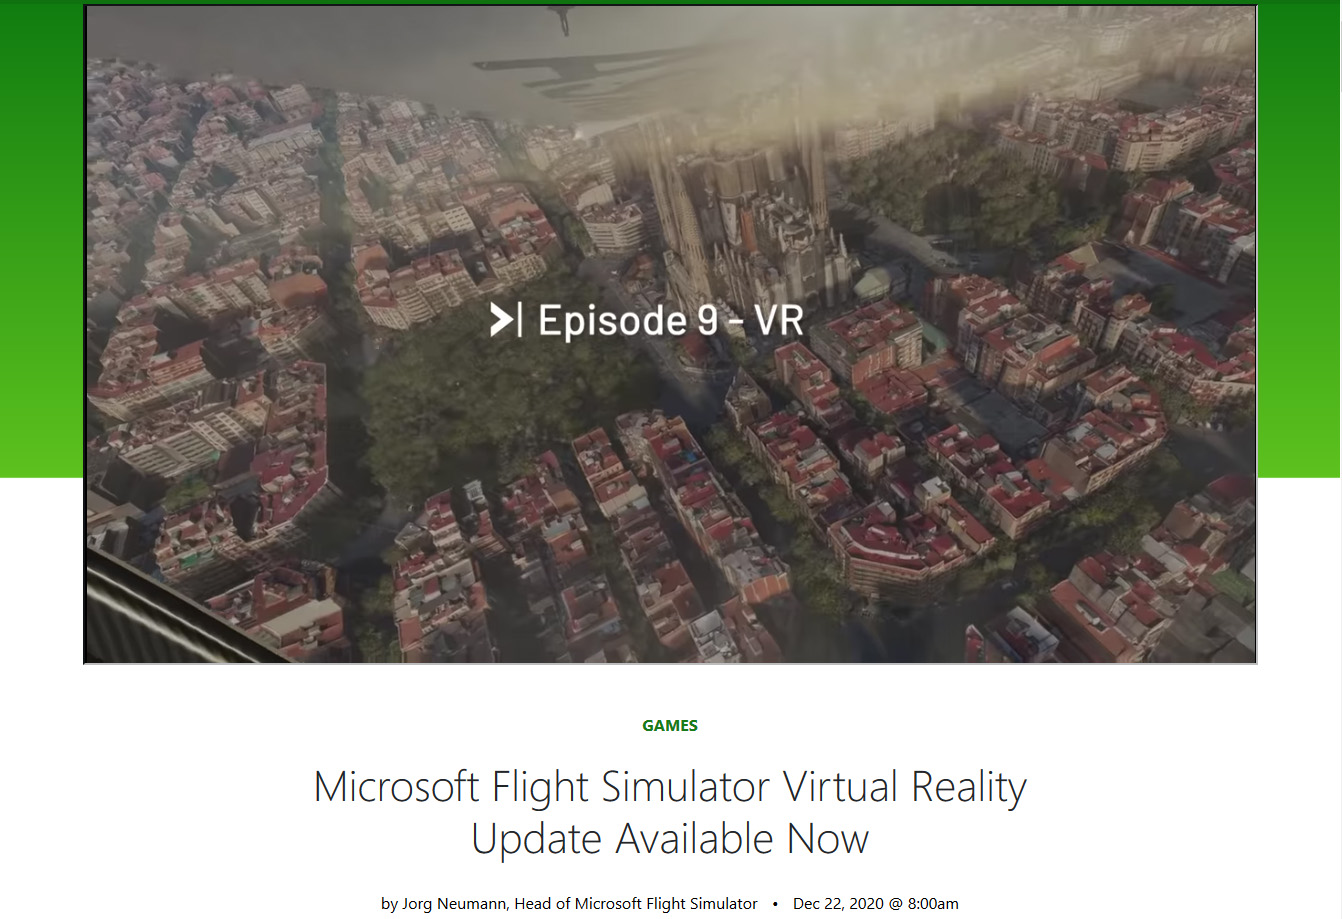 "Microsoft Flight SimulatorのVRモードは<a href=""https://news.xbox.com/en-us/2020/12/22/microsoft-flight-simulator-virtual-reality-update-available-now/"" class=""deliver_inner_content i"">昨年末のアップデートで実装された</a>機能。"